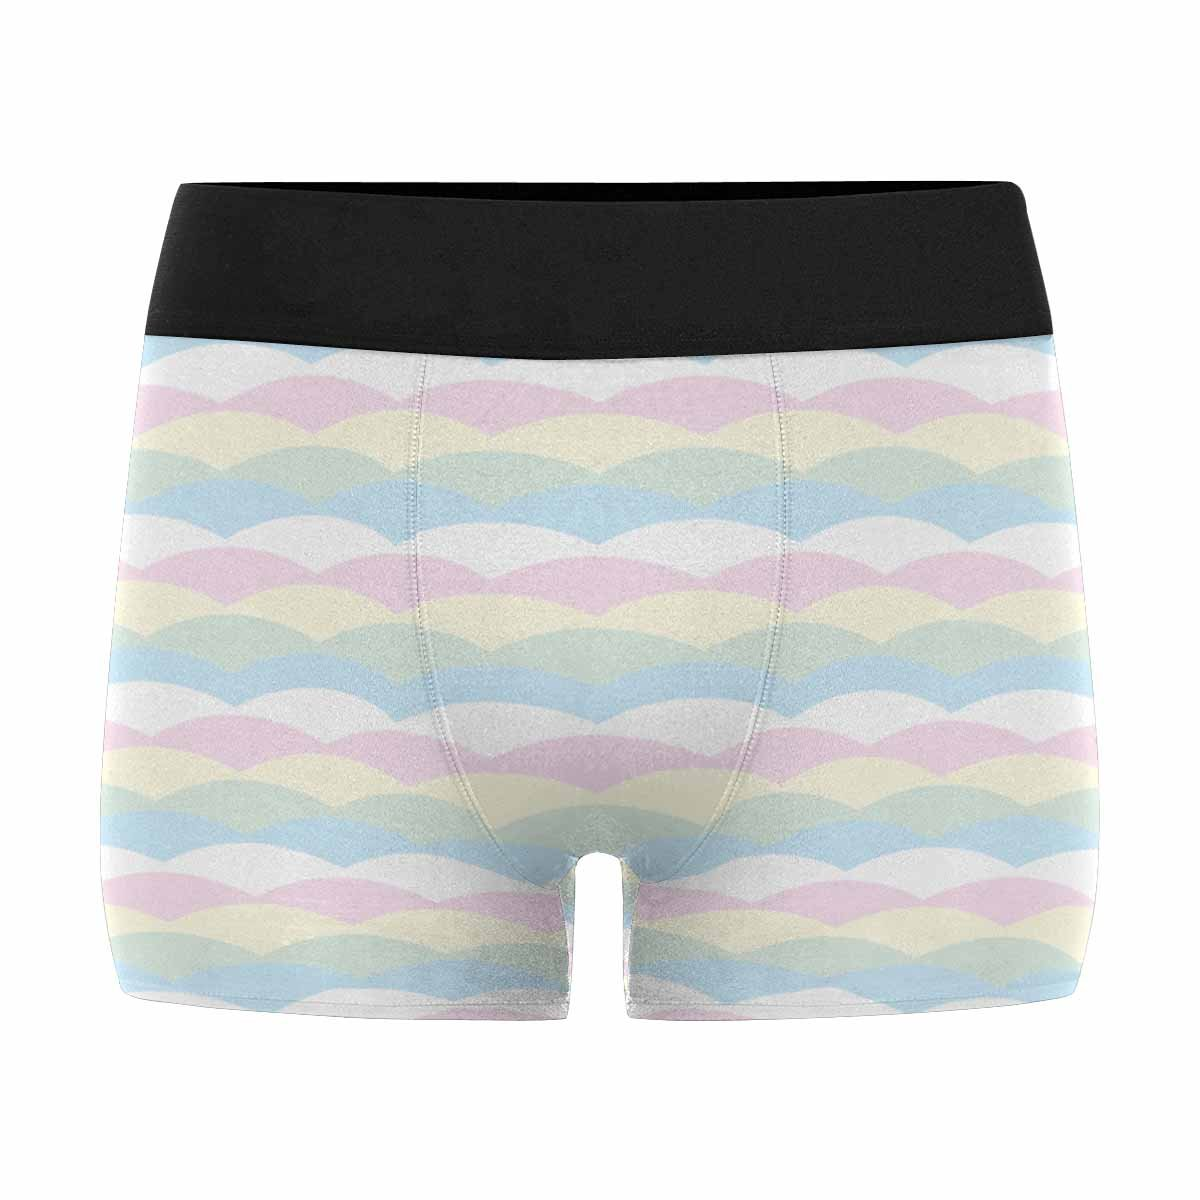 INTERESTPRINT Boxer Briefs Mens Underwear Pastel Color Wave Pattern XS-3XL